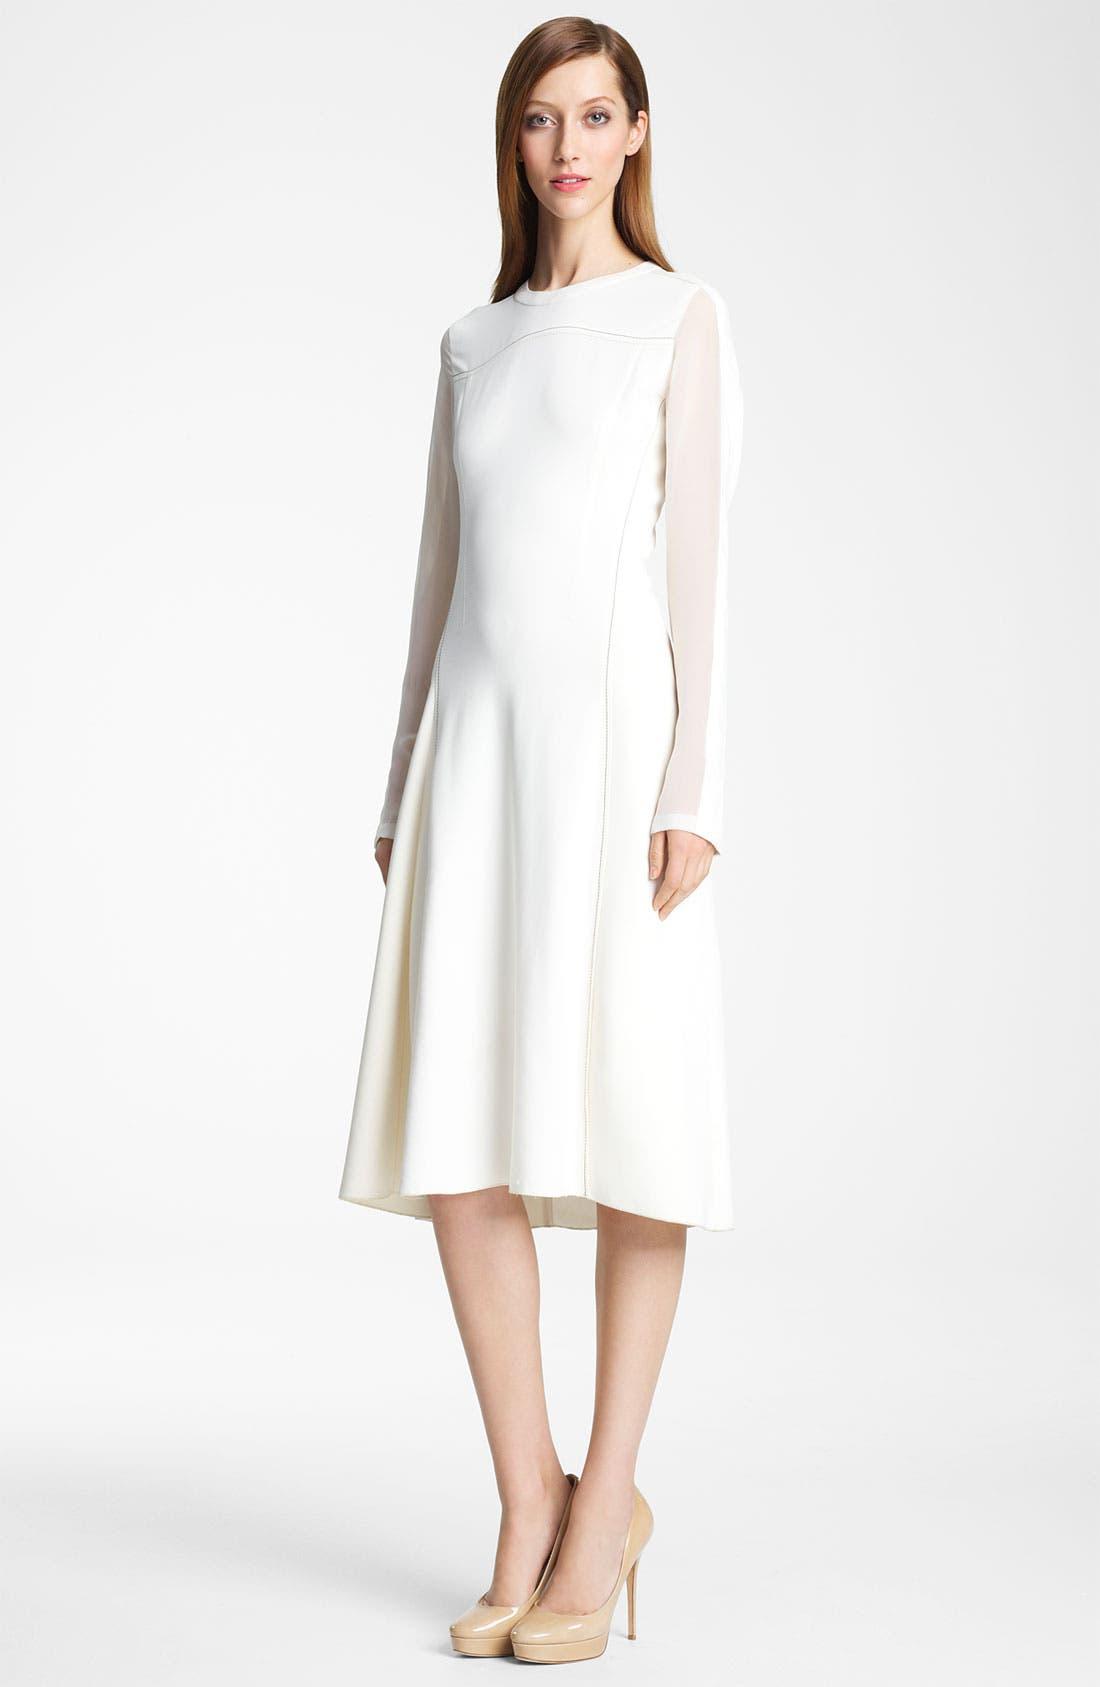 Main Image - Reed Krakoff Contrast Stitch Dress